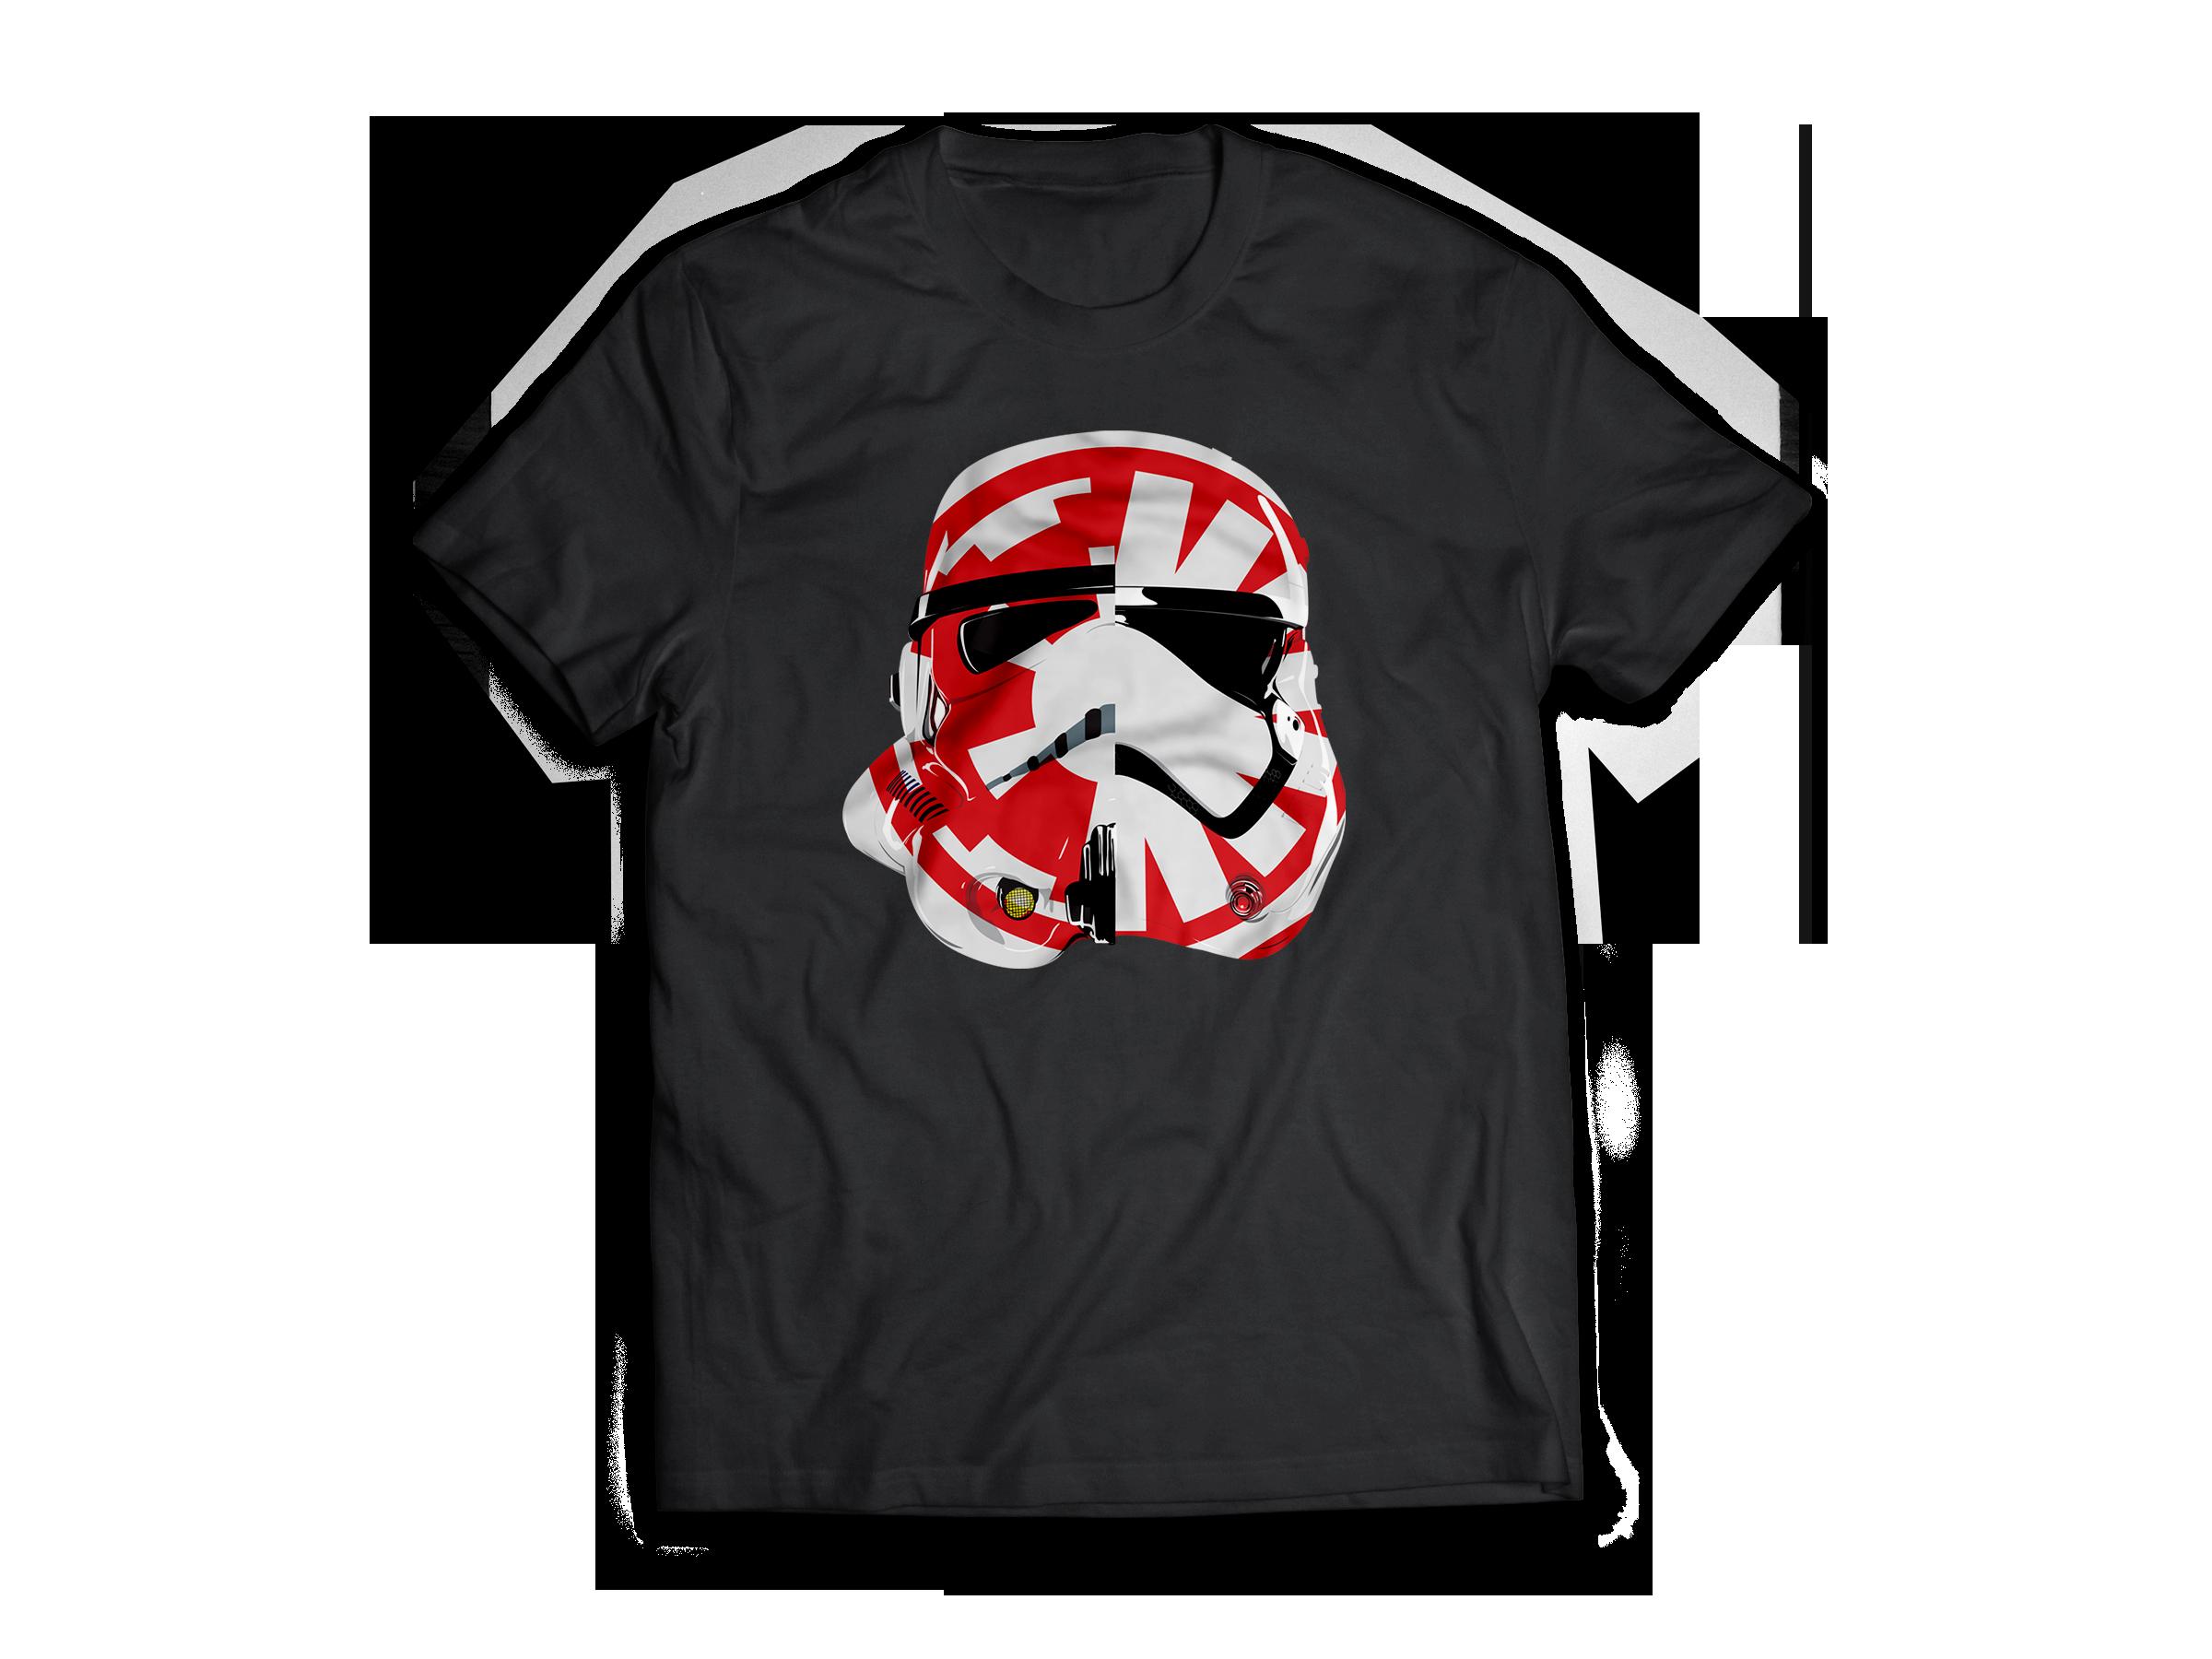 Control the Galaxy Stormtrooper T-shirt Jlane Design Teepublic